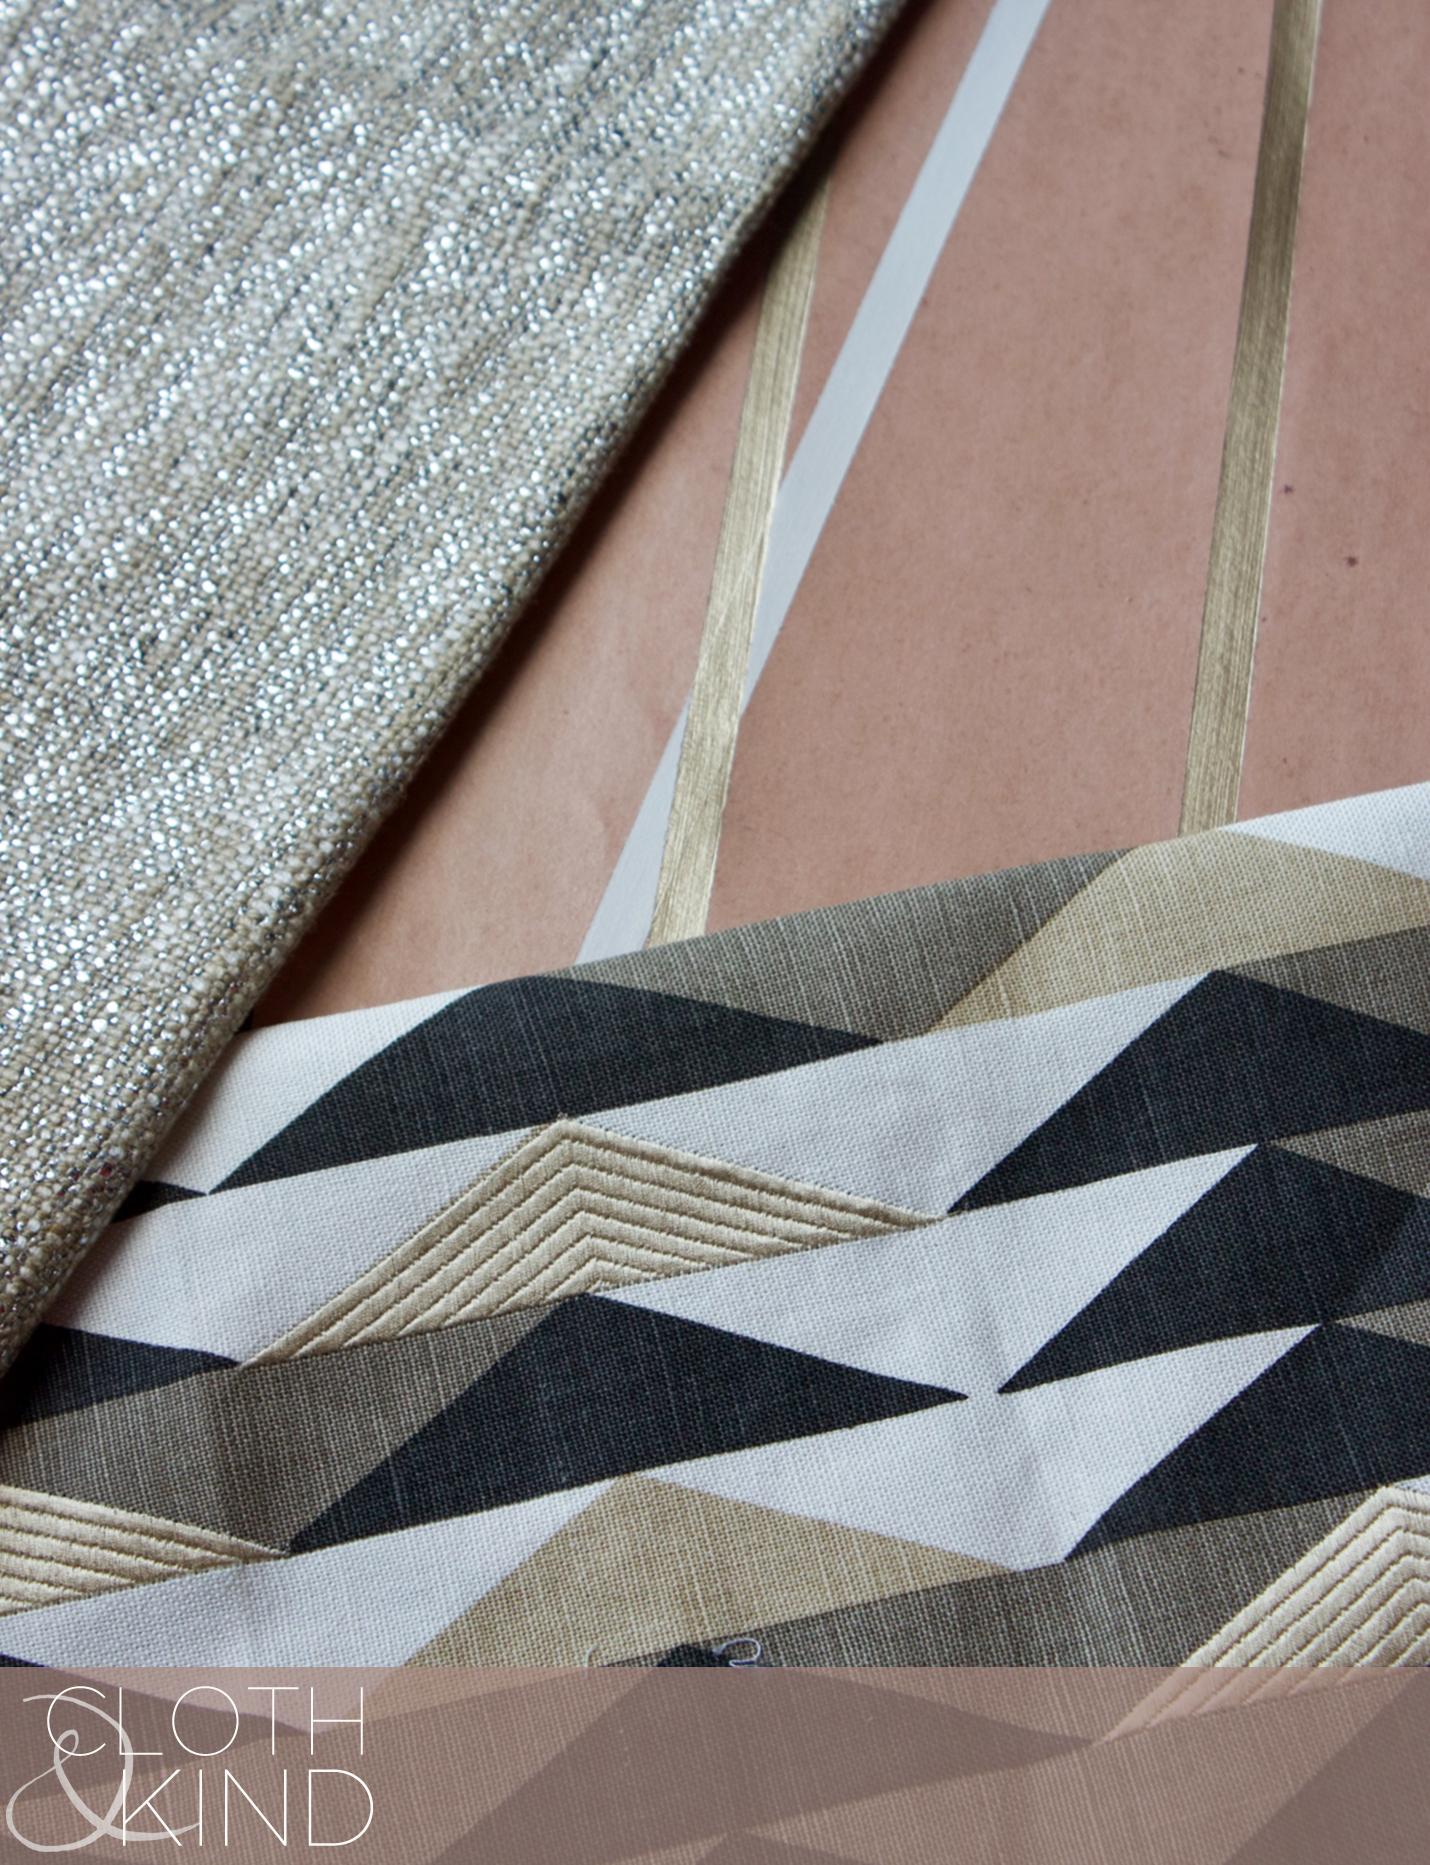 CLOTH & KIND // Palette, No. 70